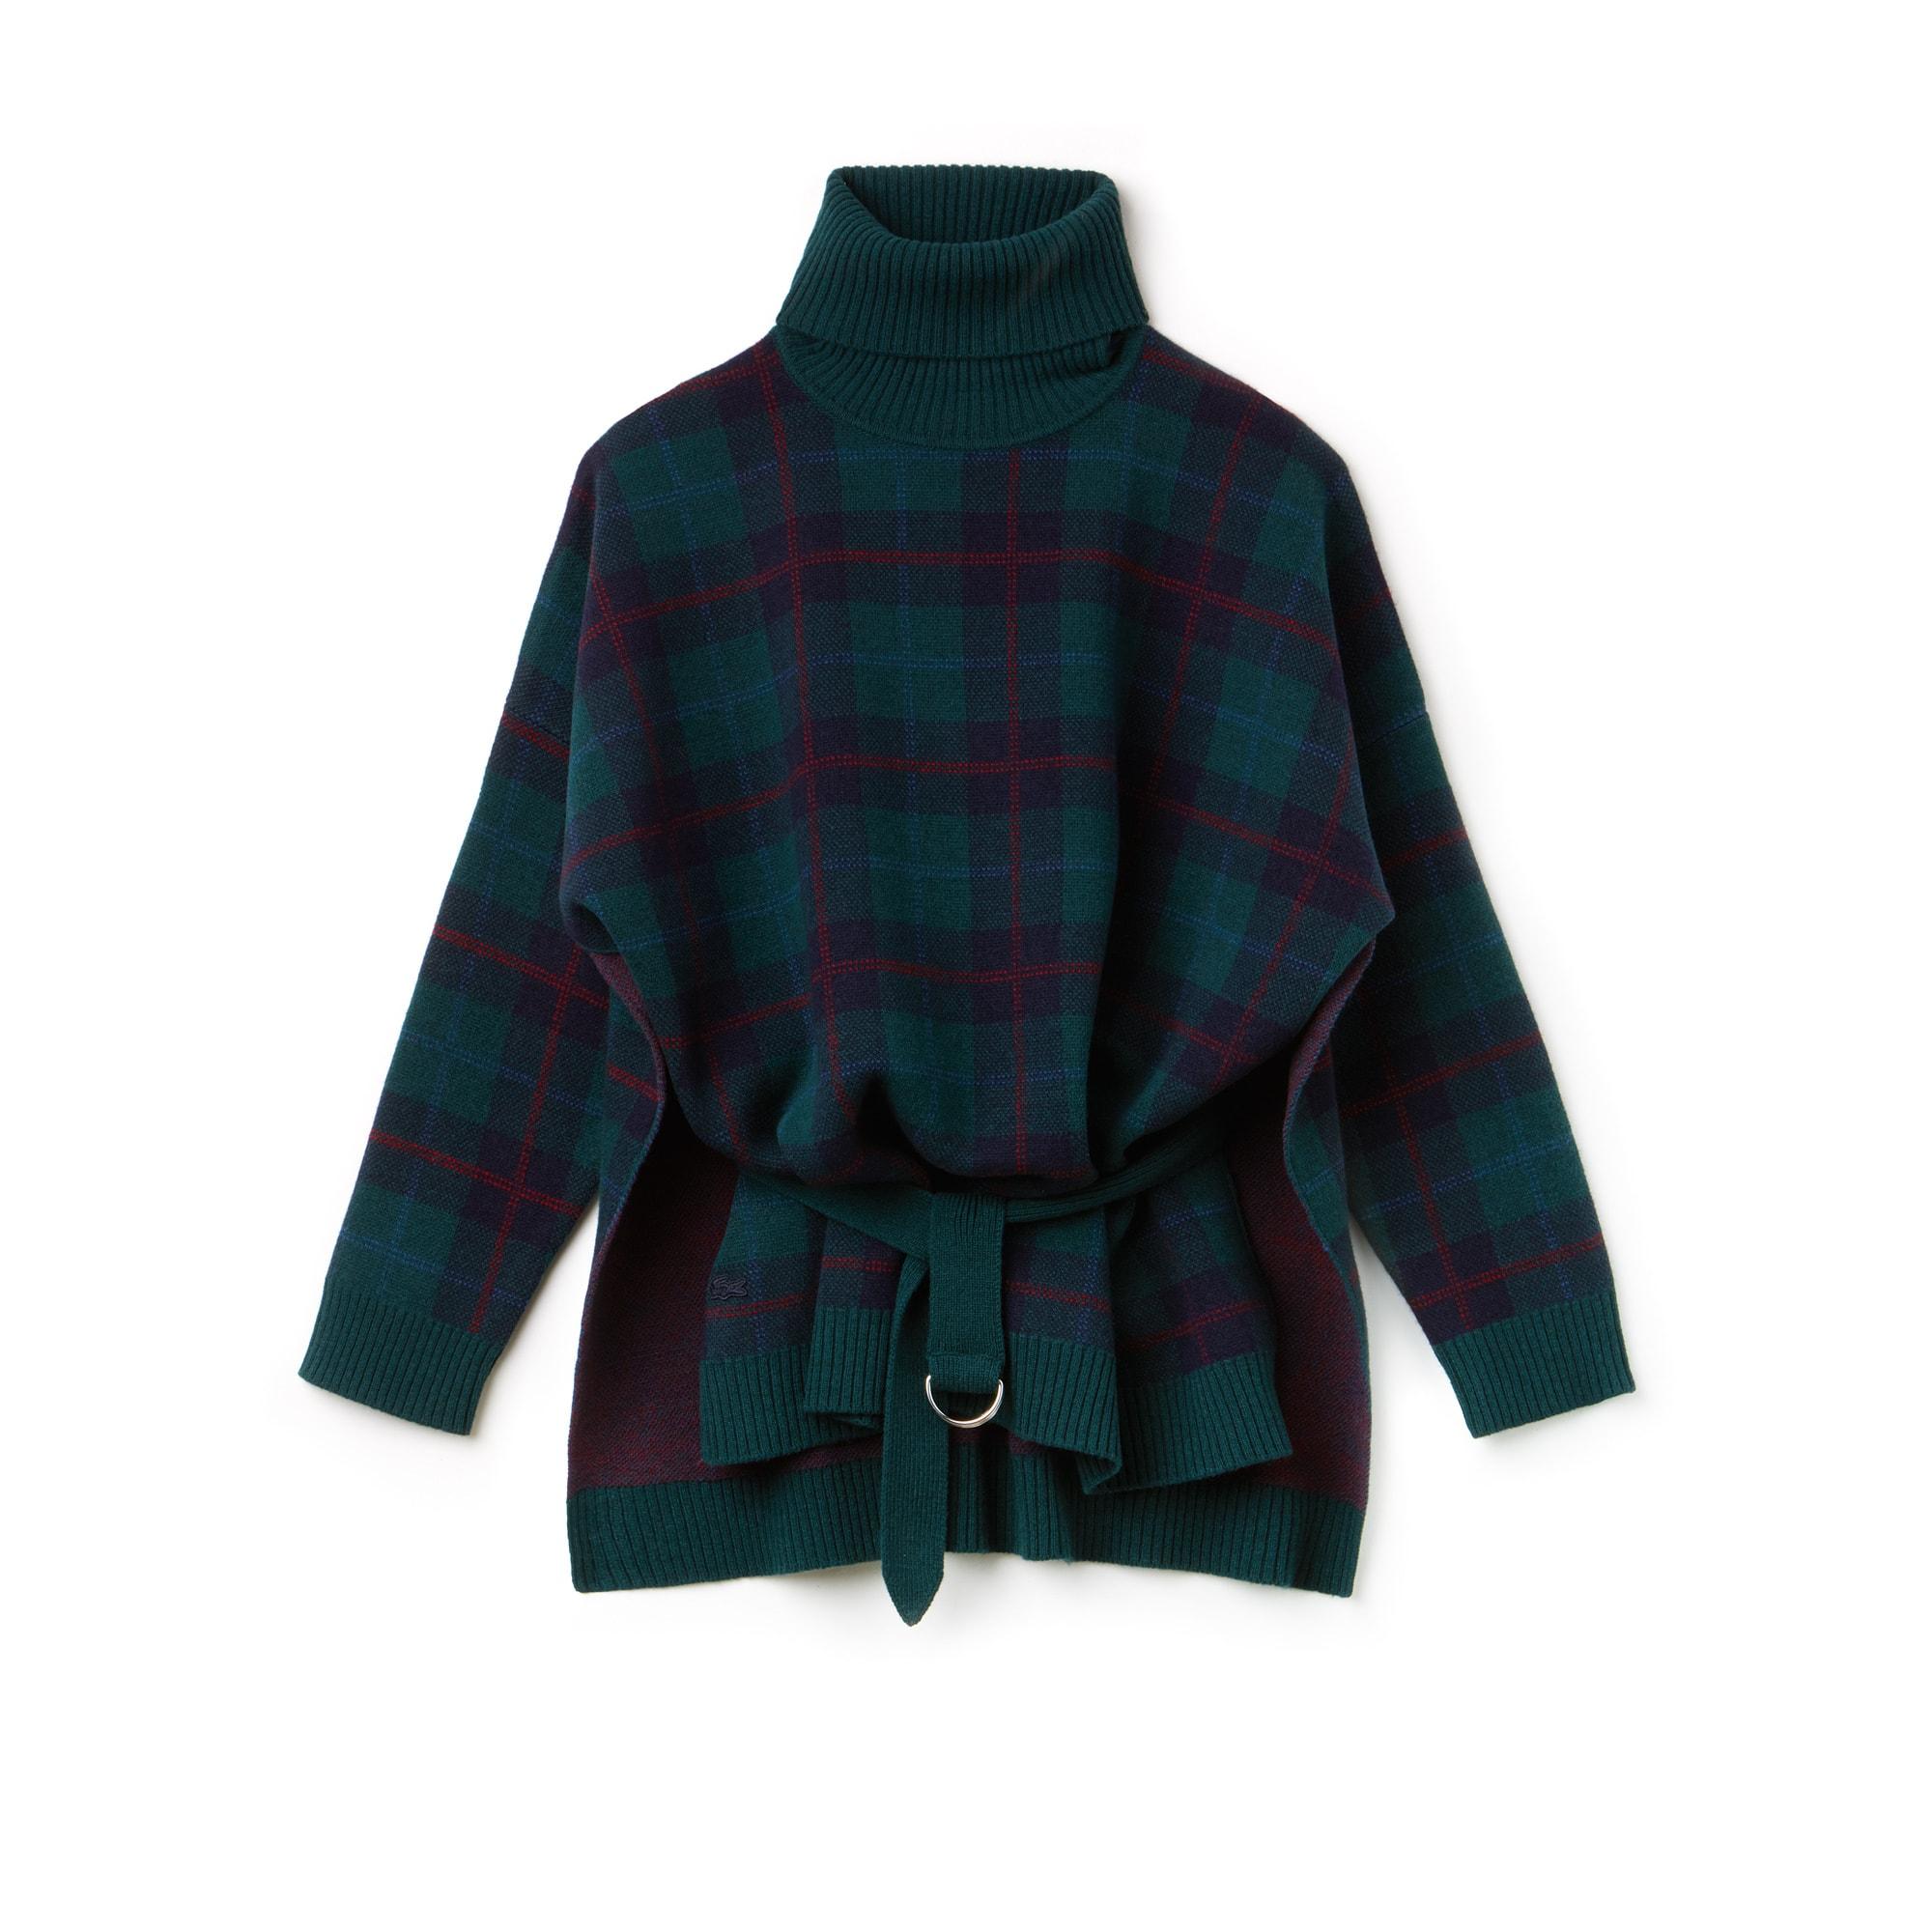 Women's Stand-Up Neck Tartan Check Print Wool Jacquard Sweater